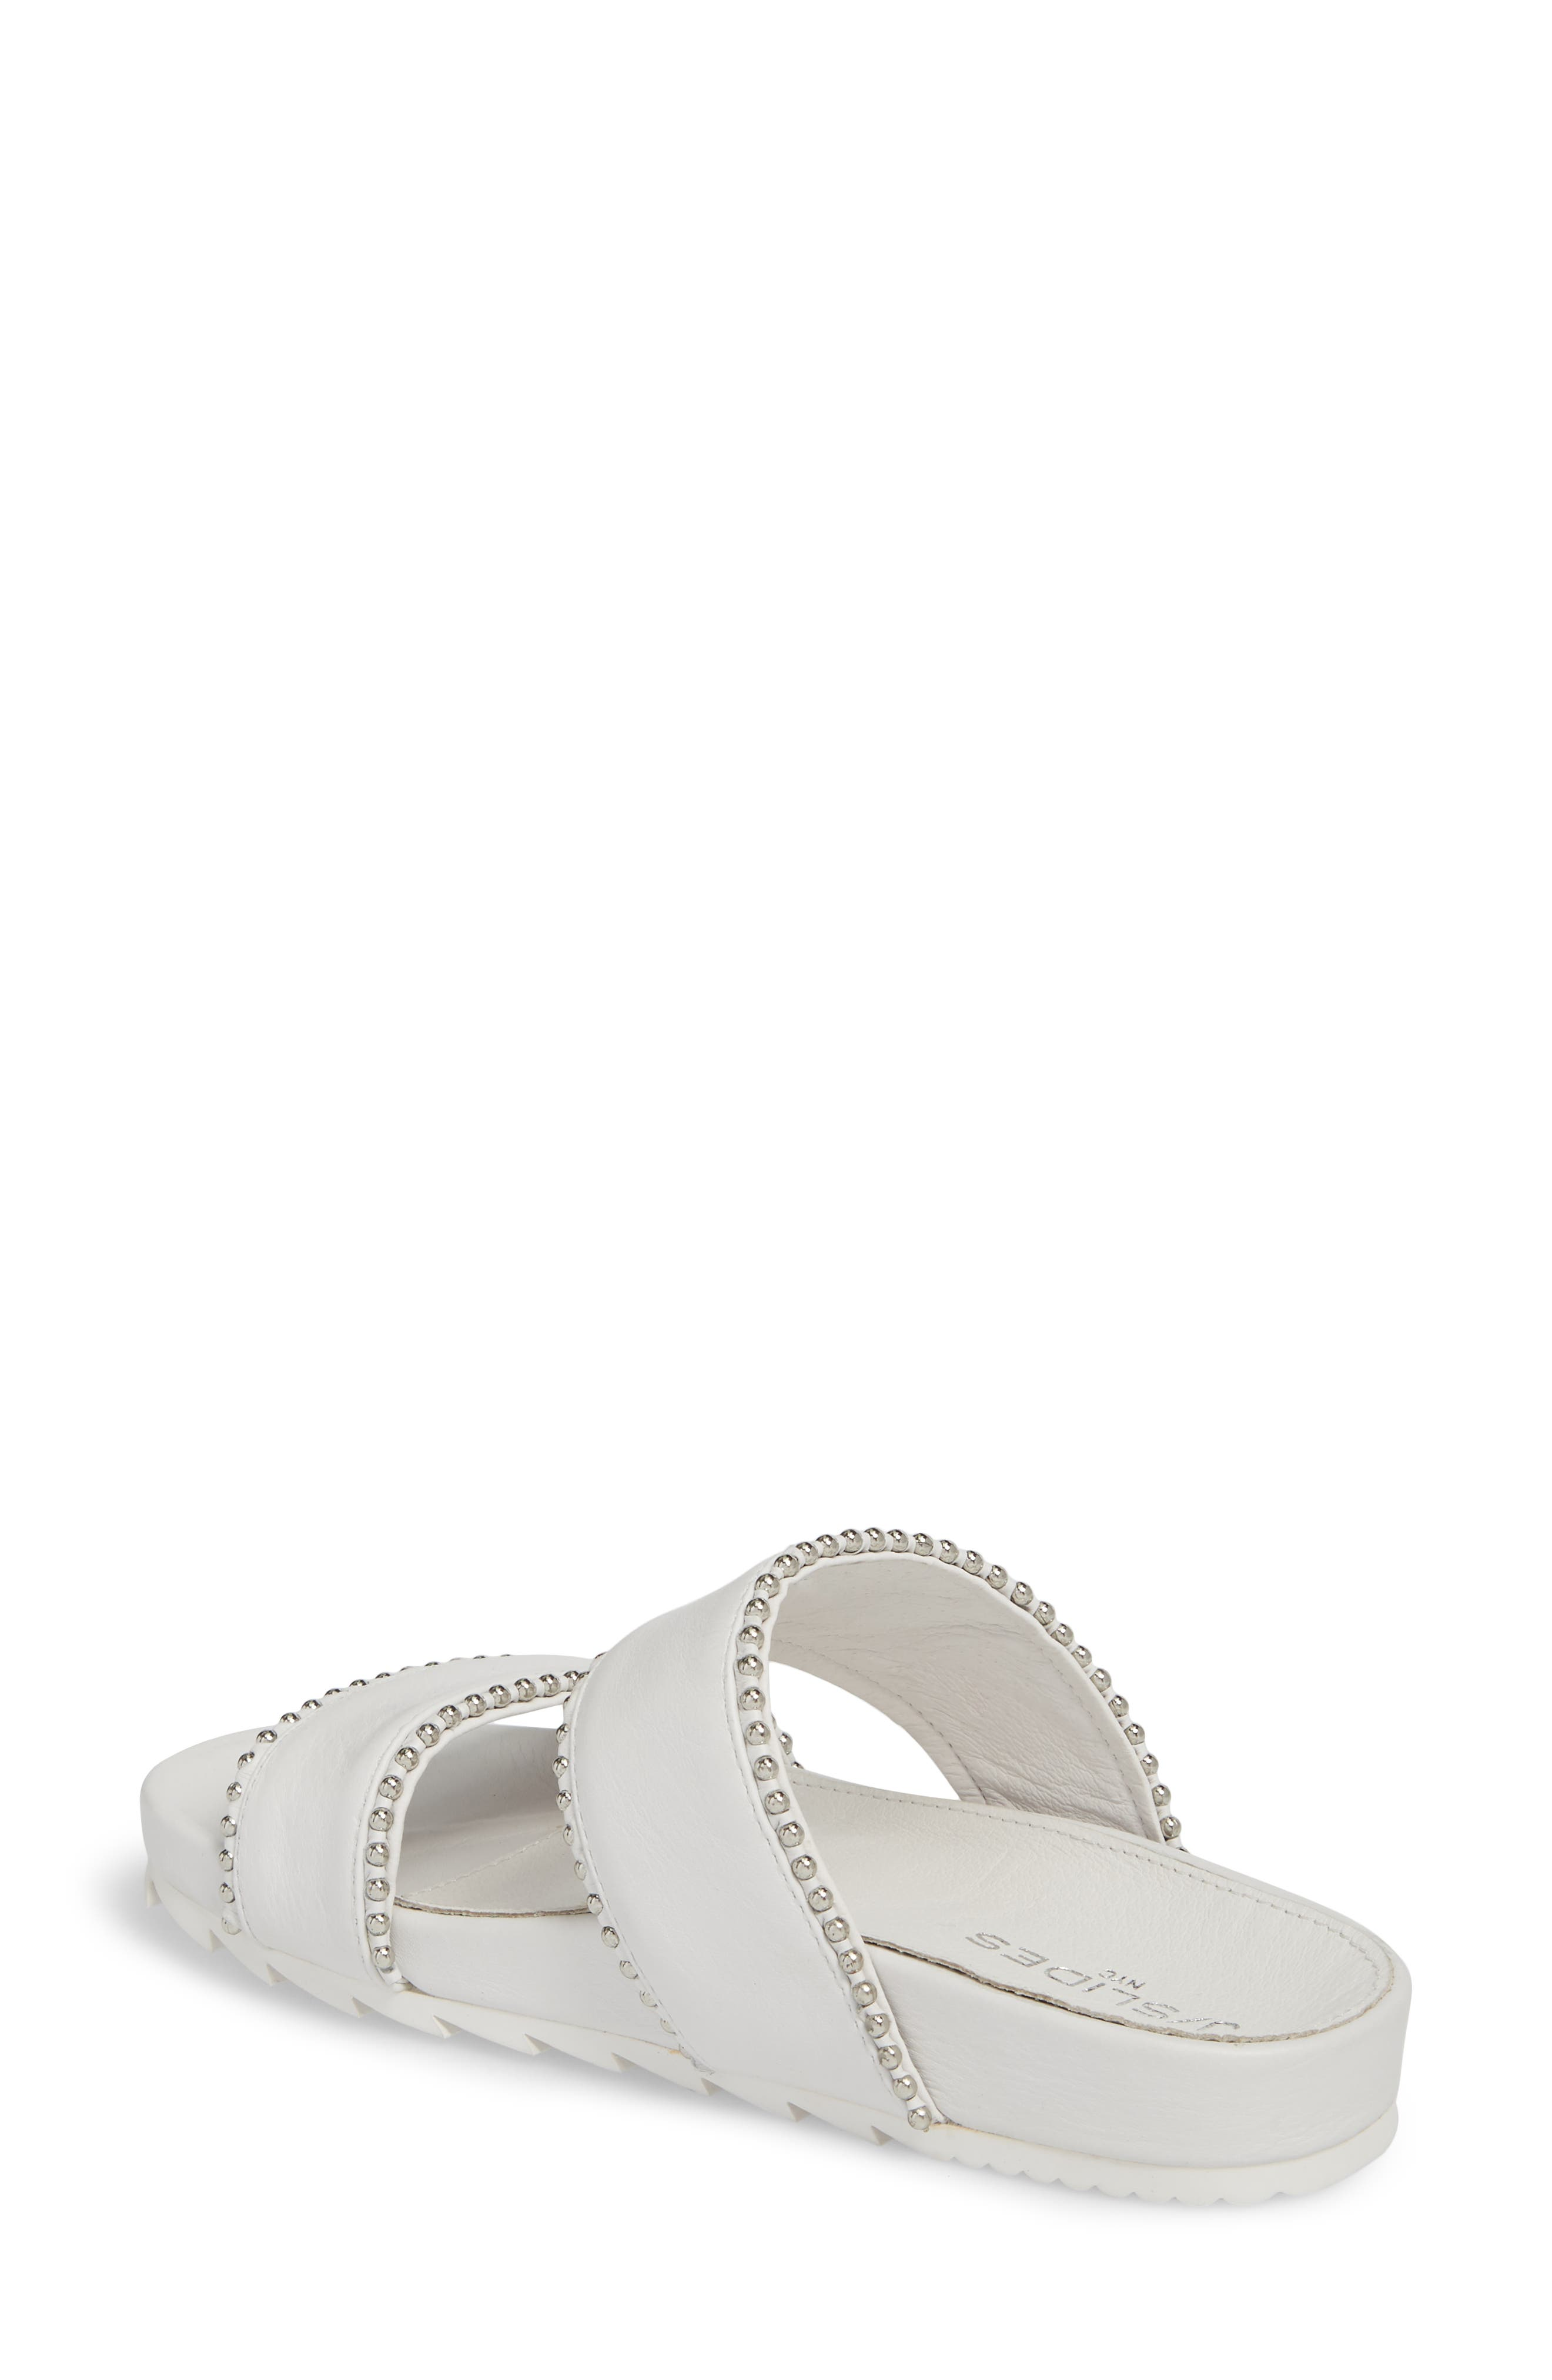 Emmie Bead Chain Slide Sandal,                             Alternate thumbnail 2, color,                             White Leather